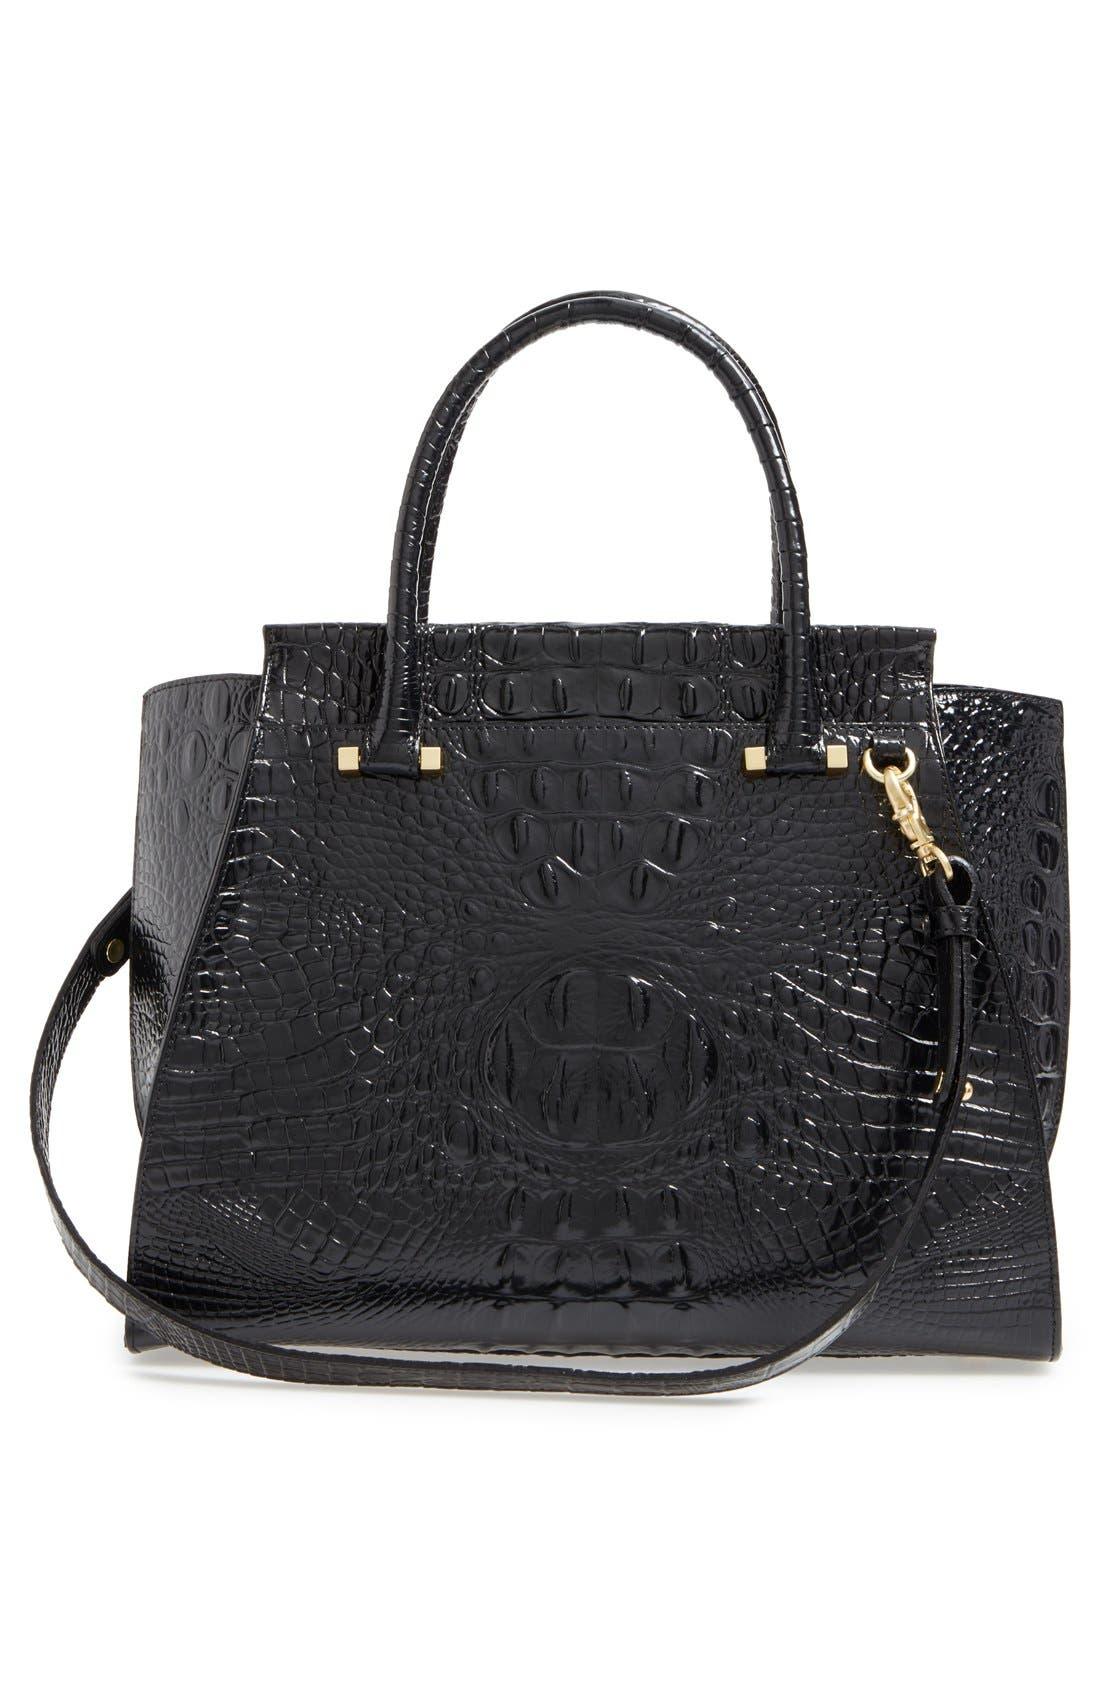 'Priscilla' Croc Embossed Leather Satchel,                             Alternate thumbnail 8, color,                             BLACK